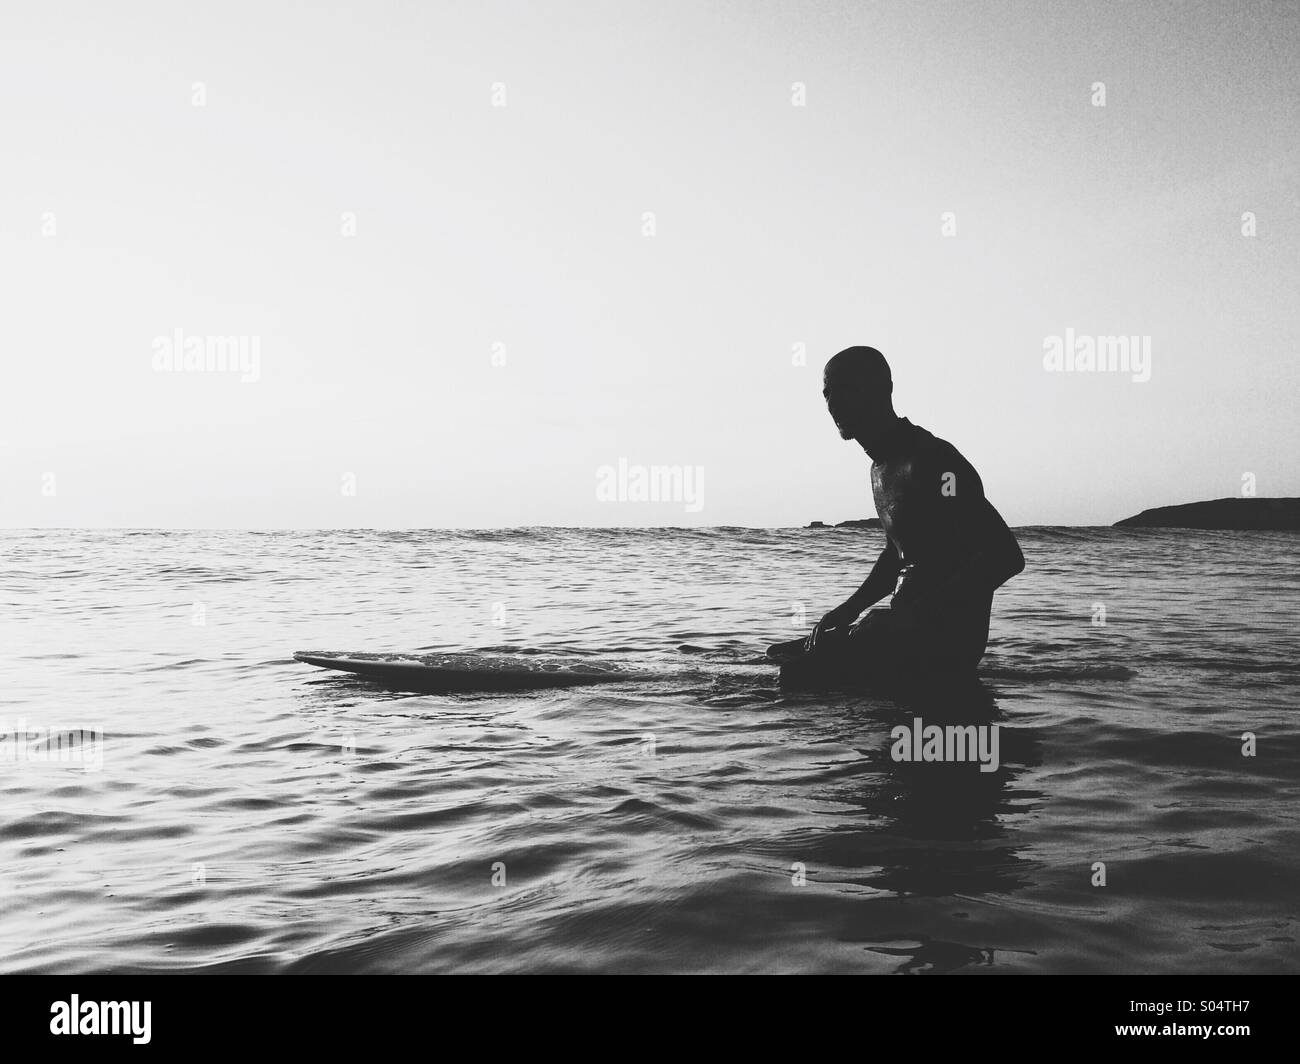 Navegante de surf esperando olas. Imagen De Stock